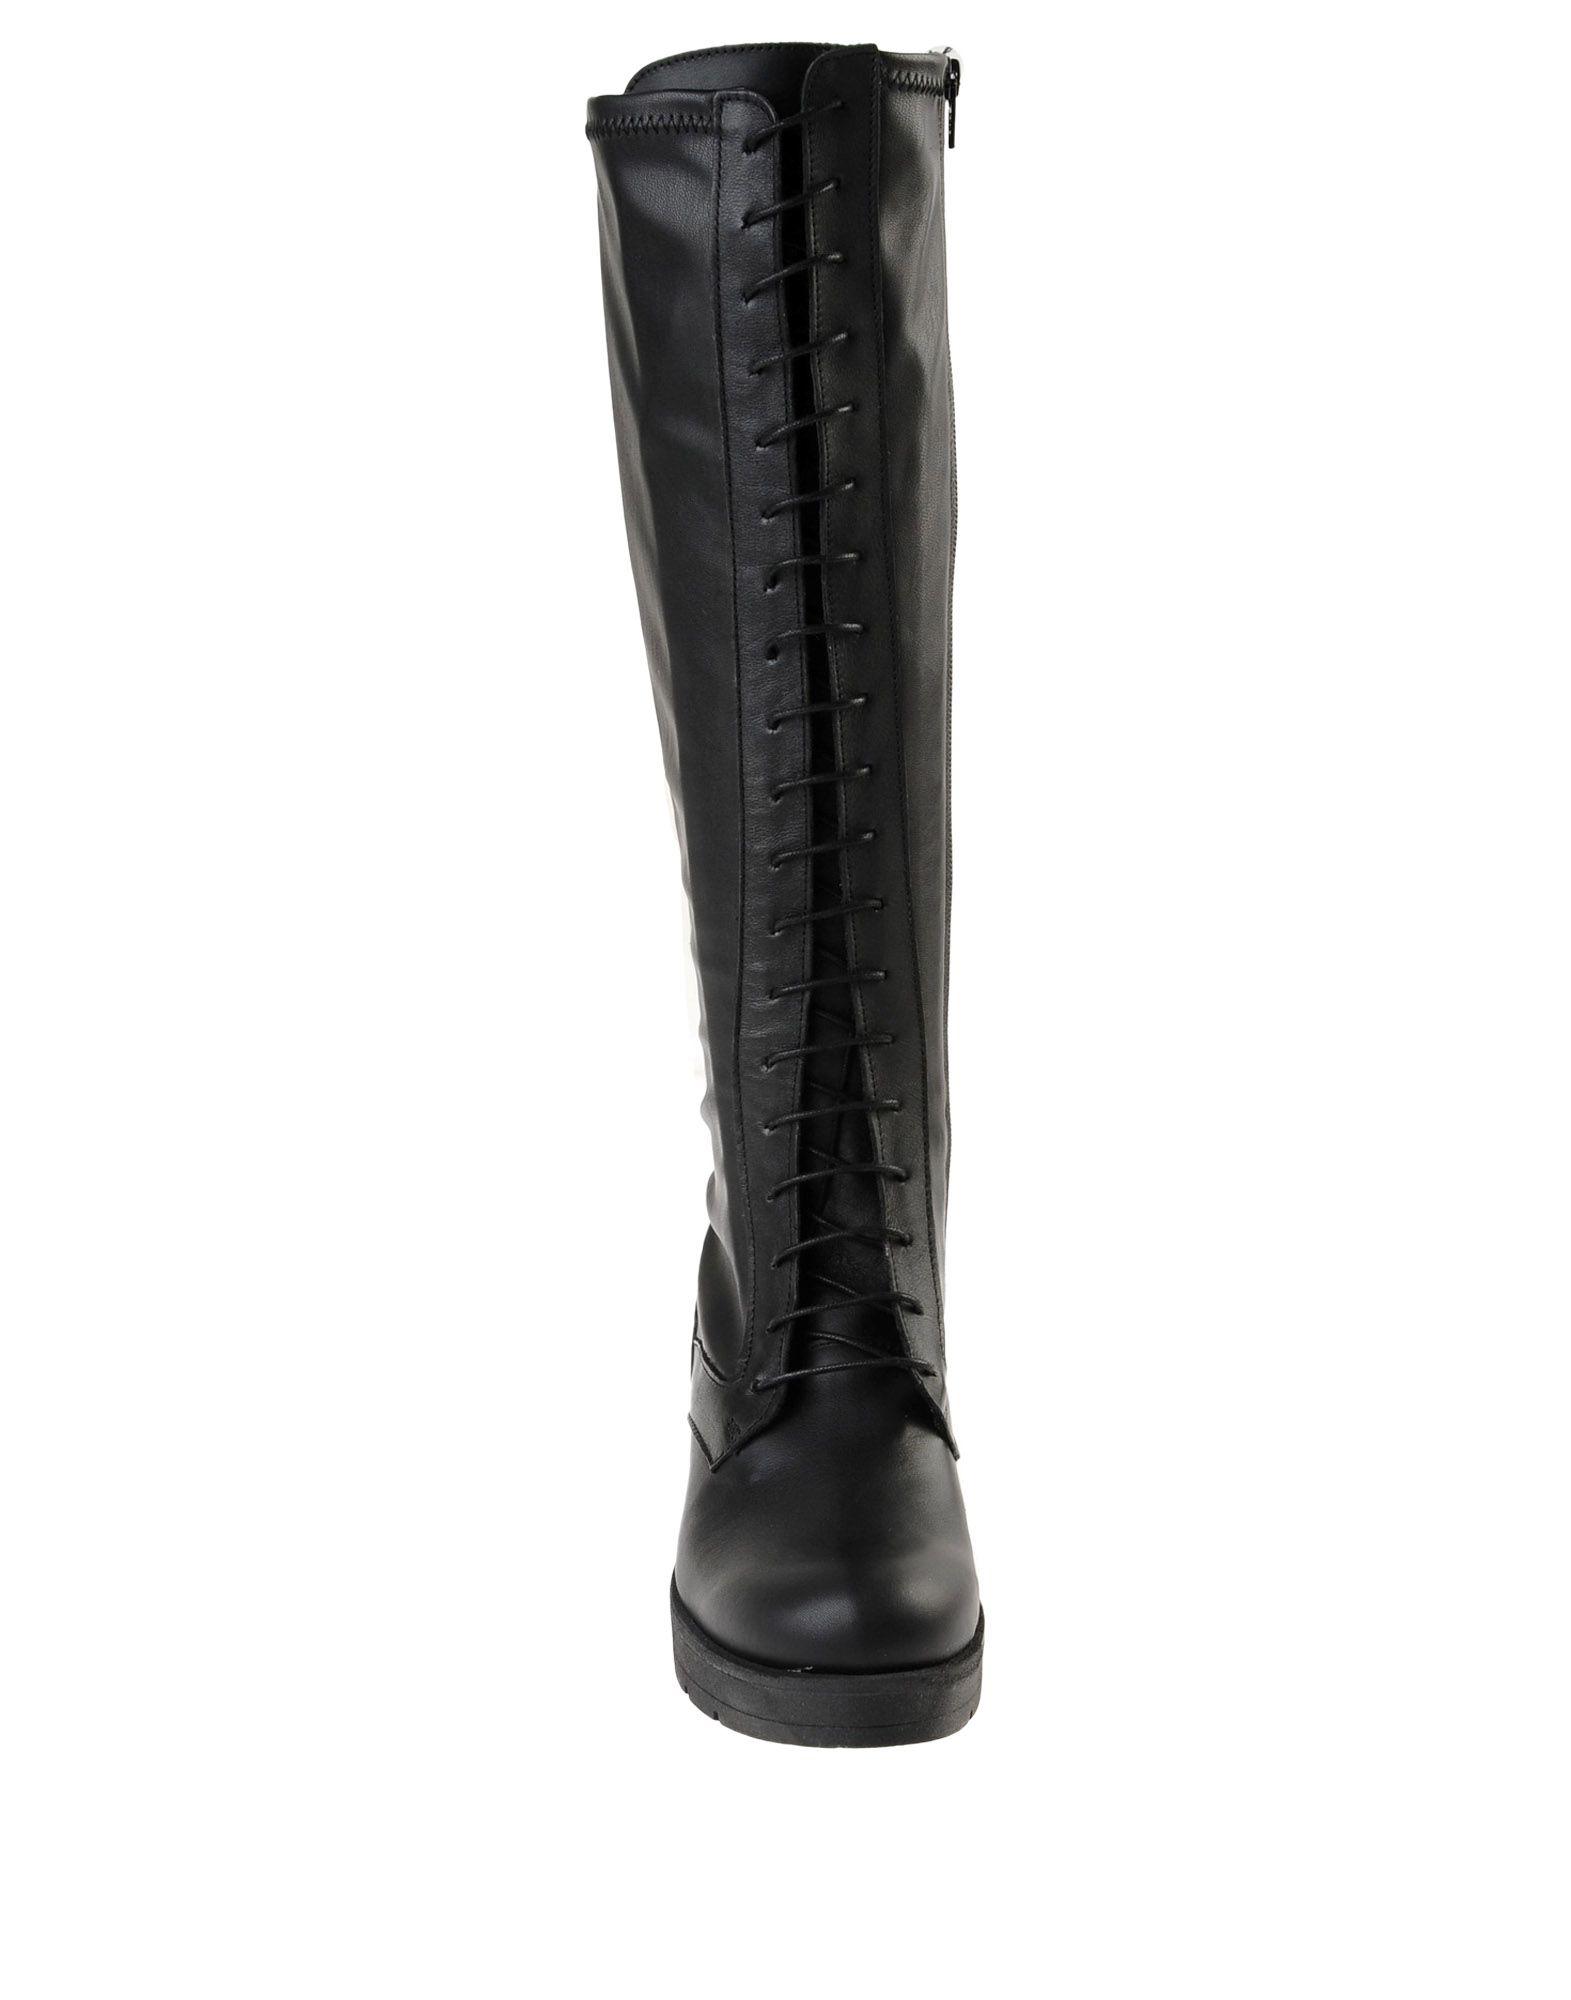 Stilvolle Stiefel billige Schuhe Fabrizio Chini Stiefel Stilvolle Damen  11535689SH 59b284